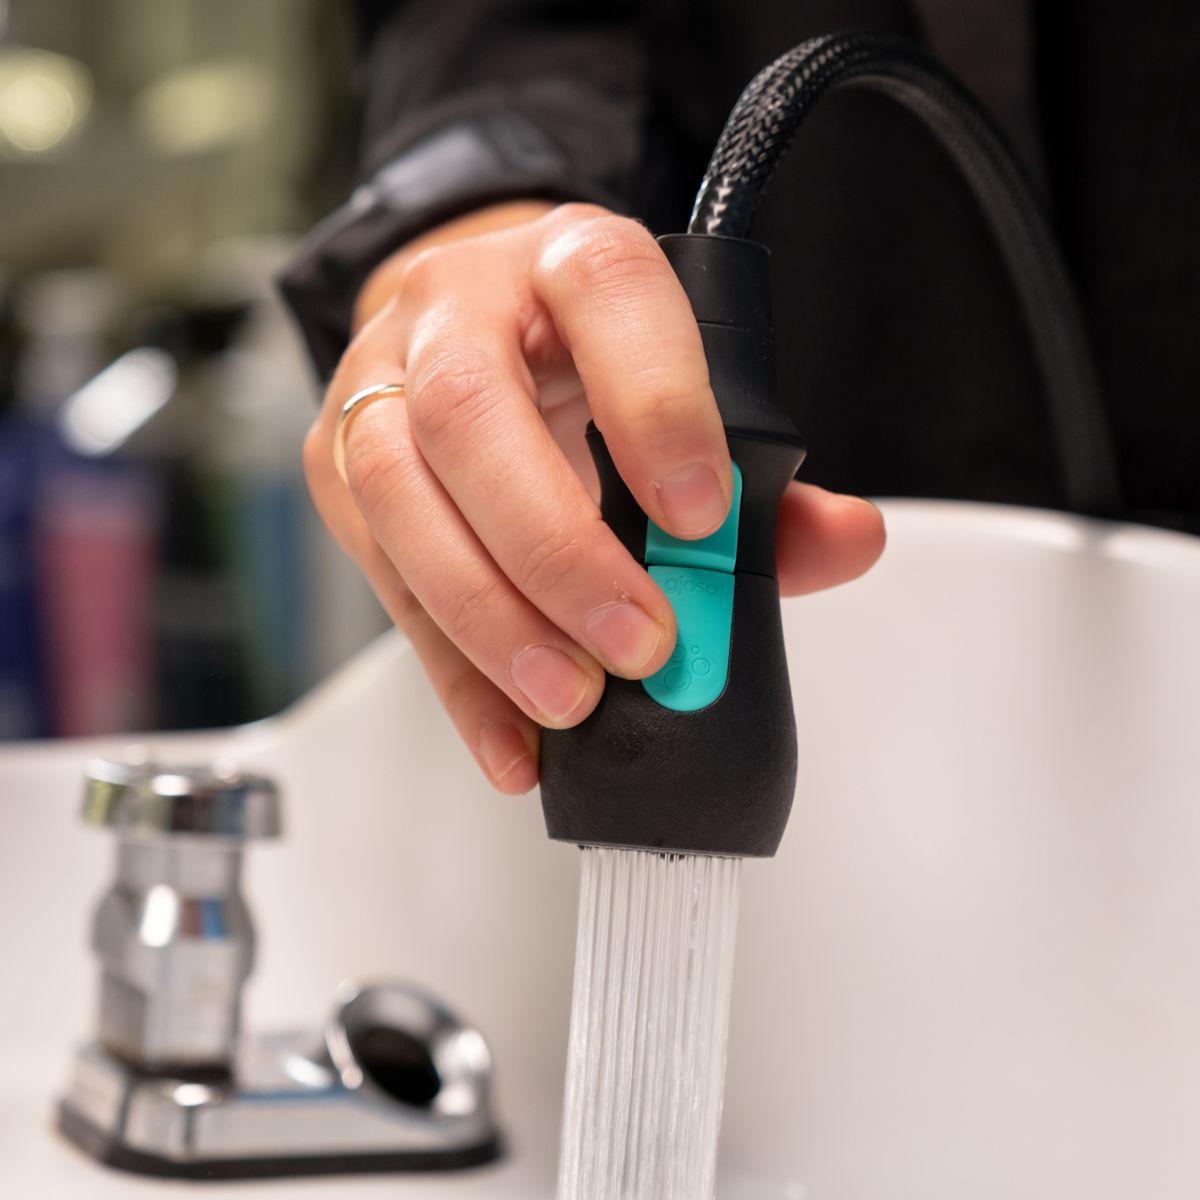 Saving water, one salon visit at a time.